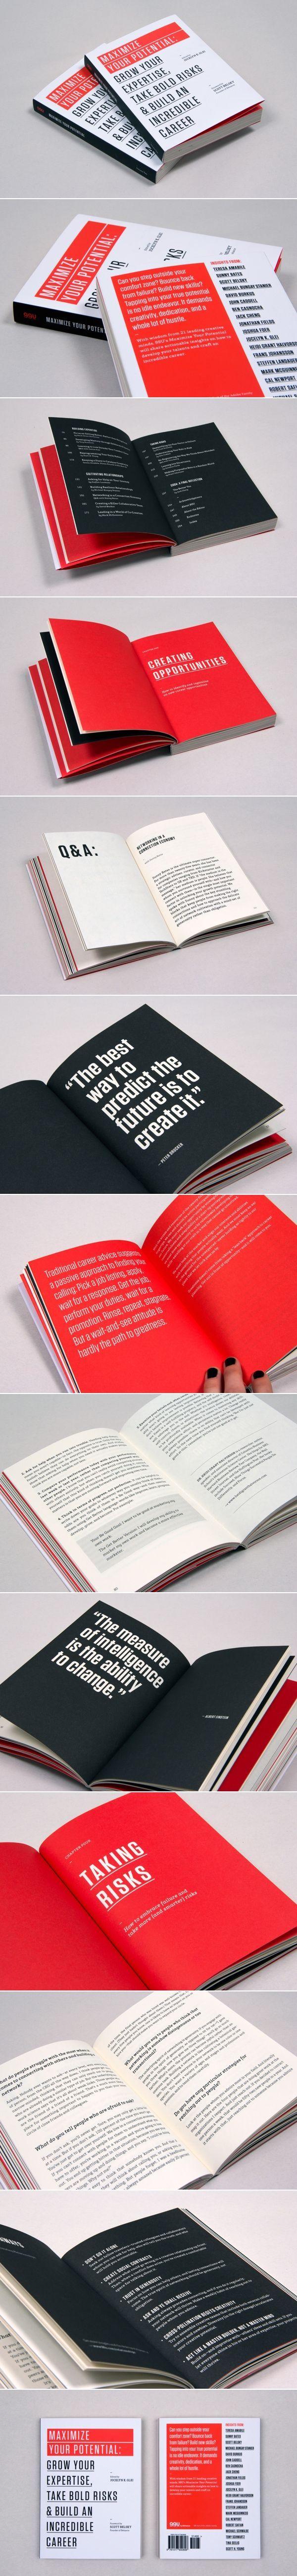 194 best Editorial Design images on Pinterest | Editorial design ...